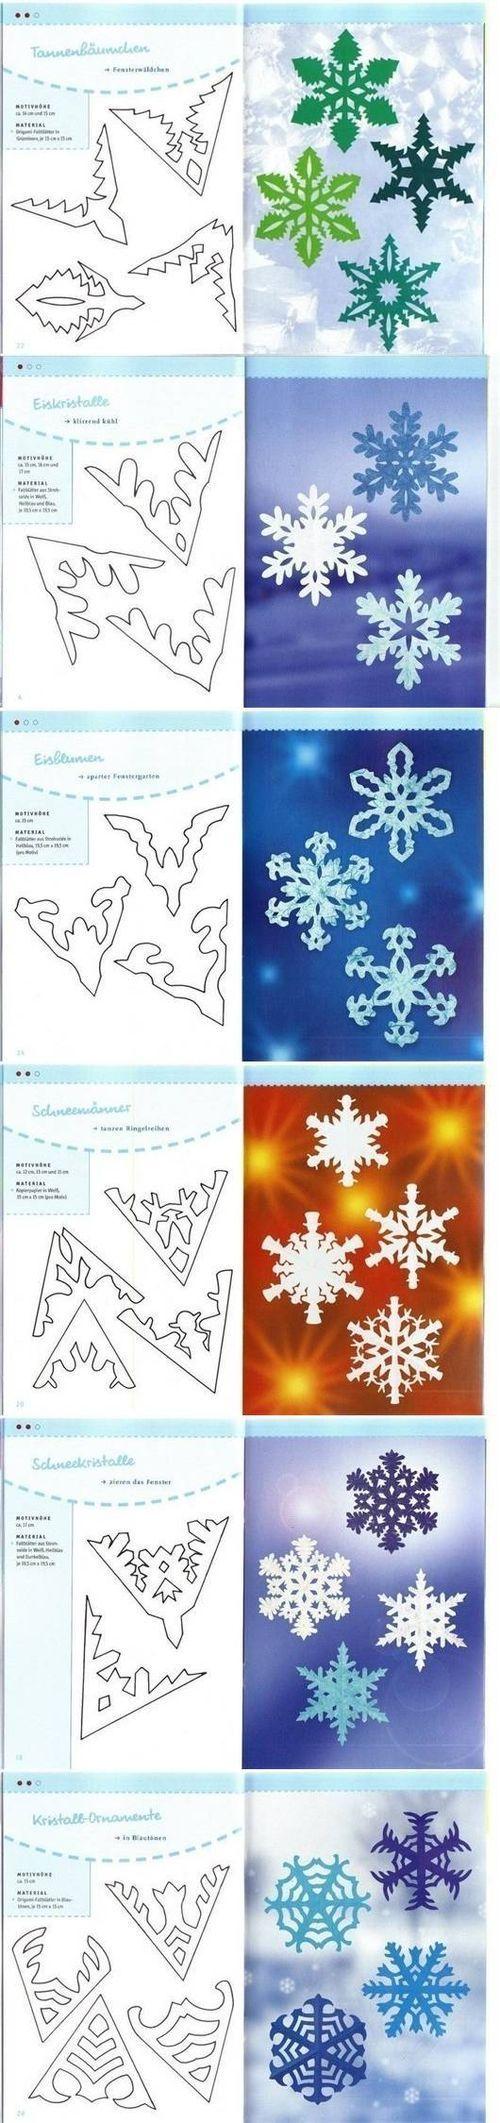 Snowflakes                                                                                                                                                     Mehr